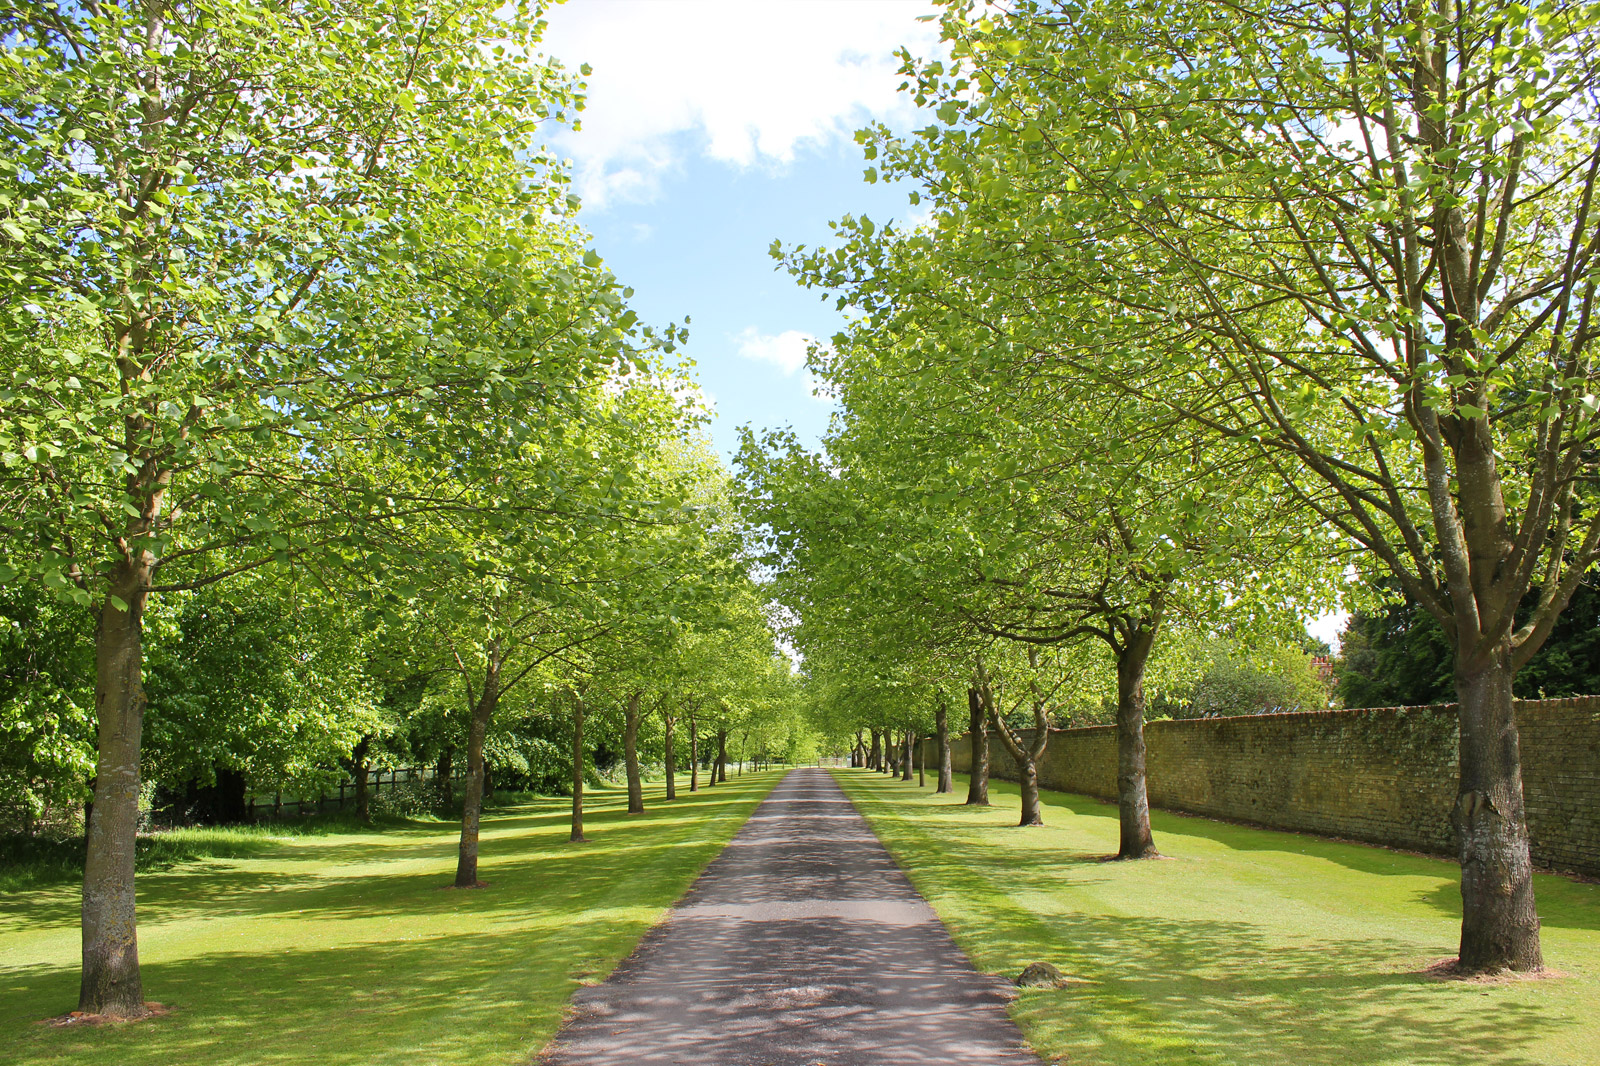 Chippenham Park